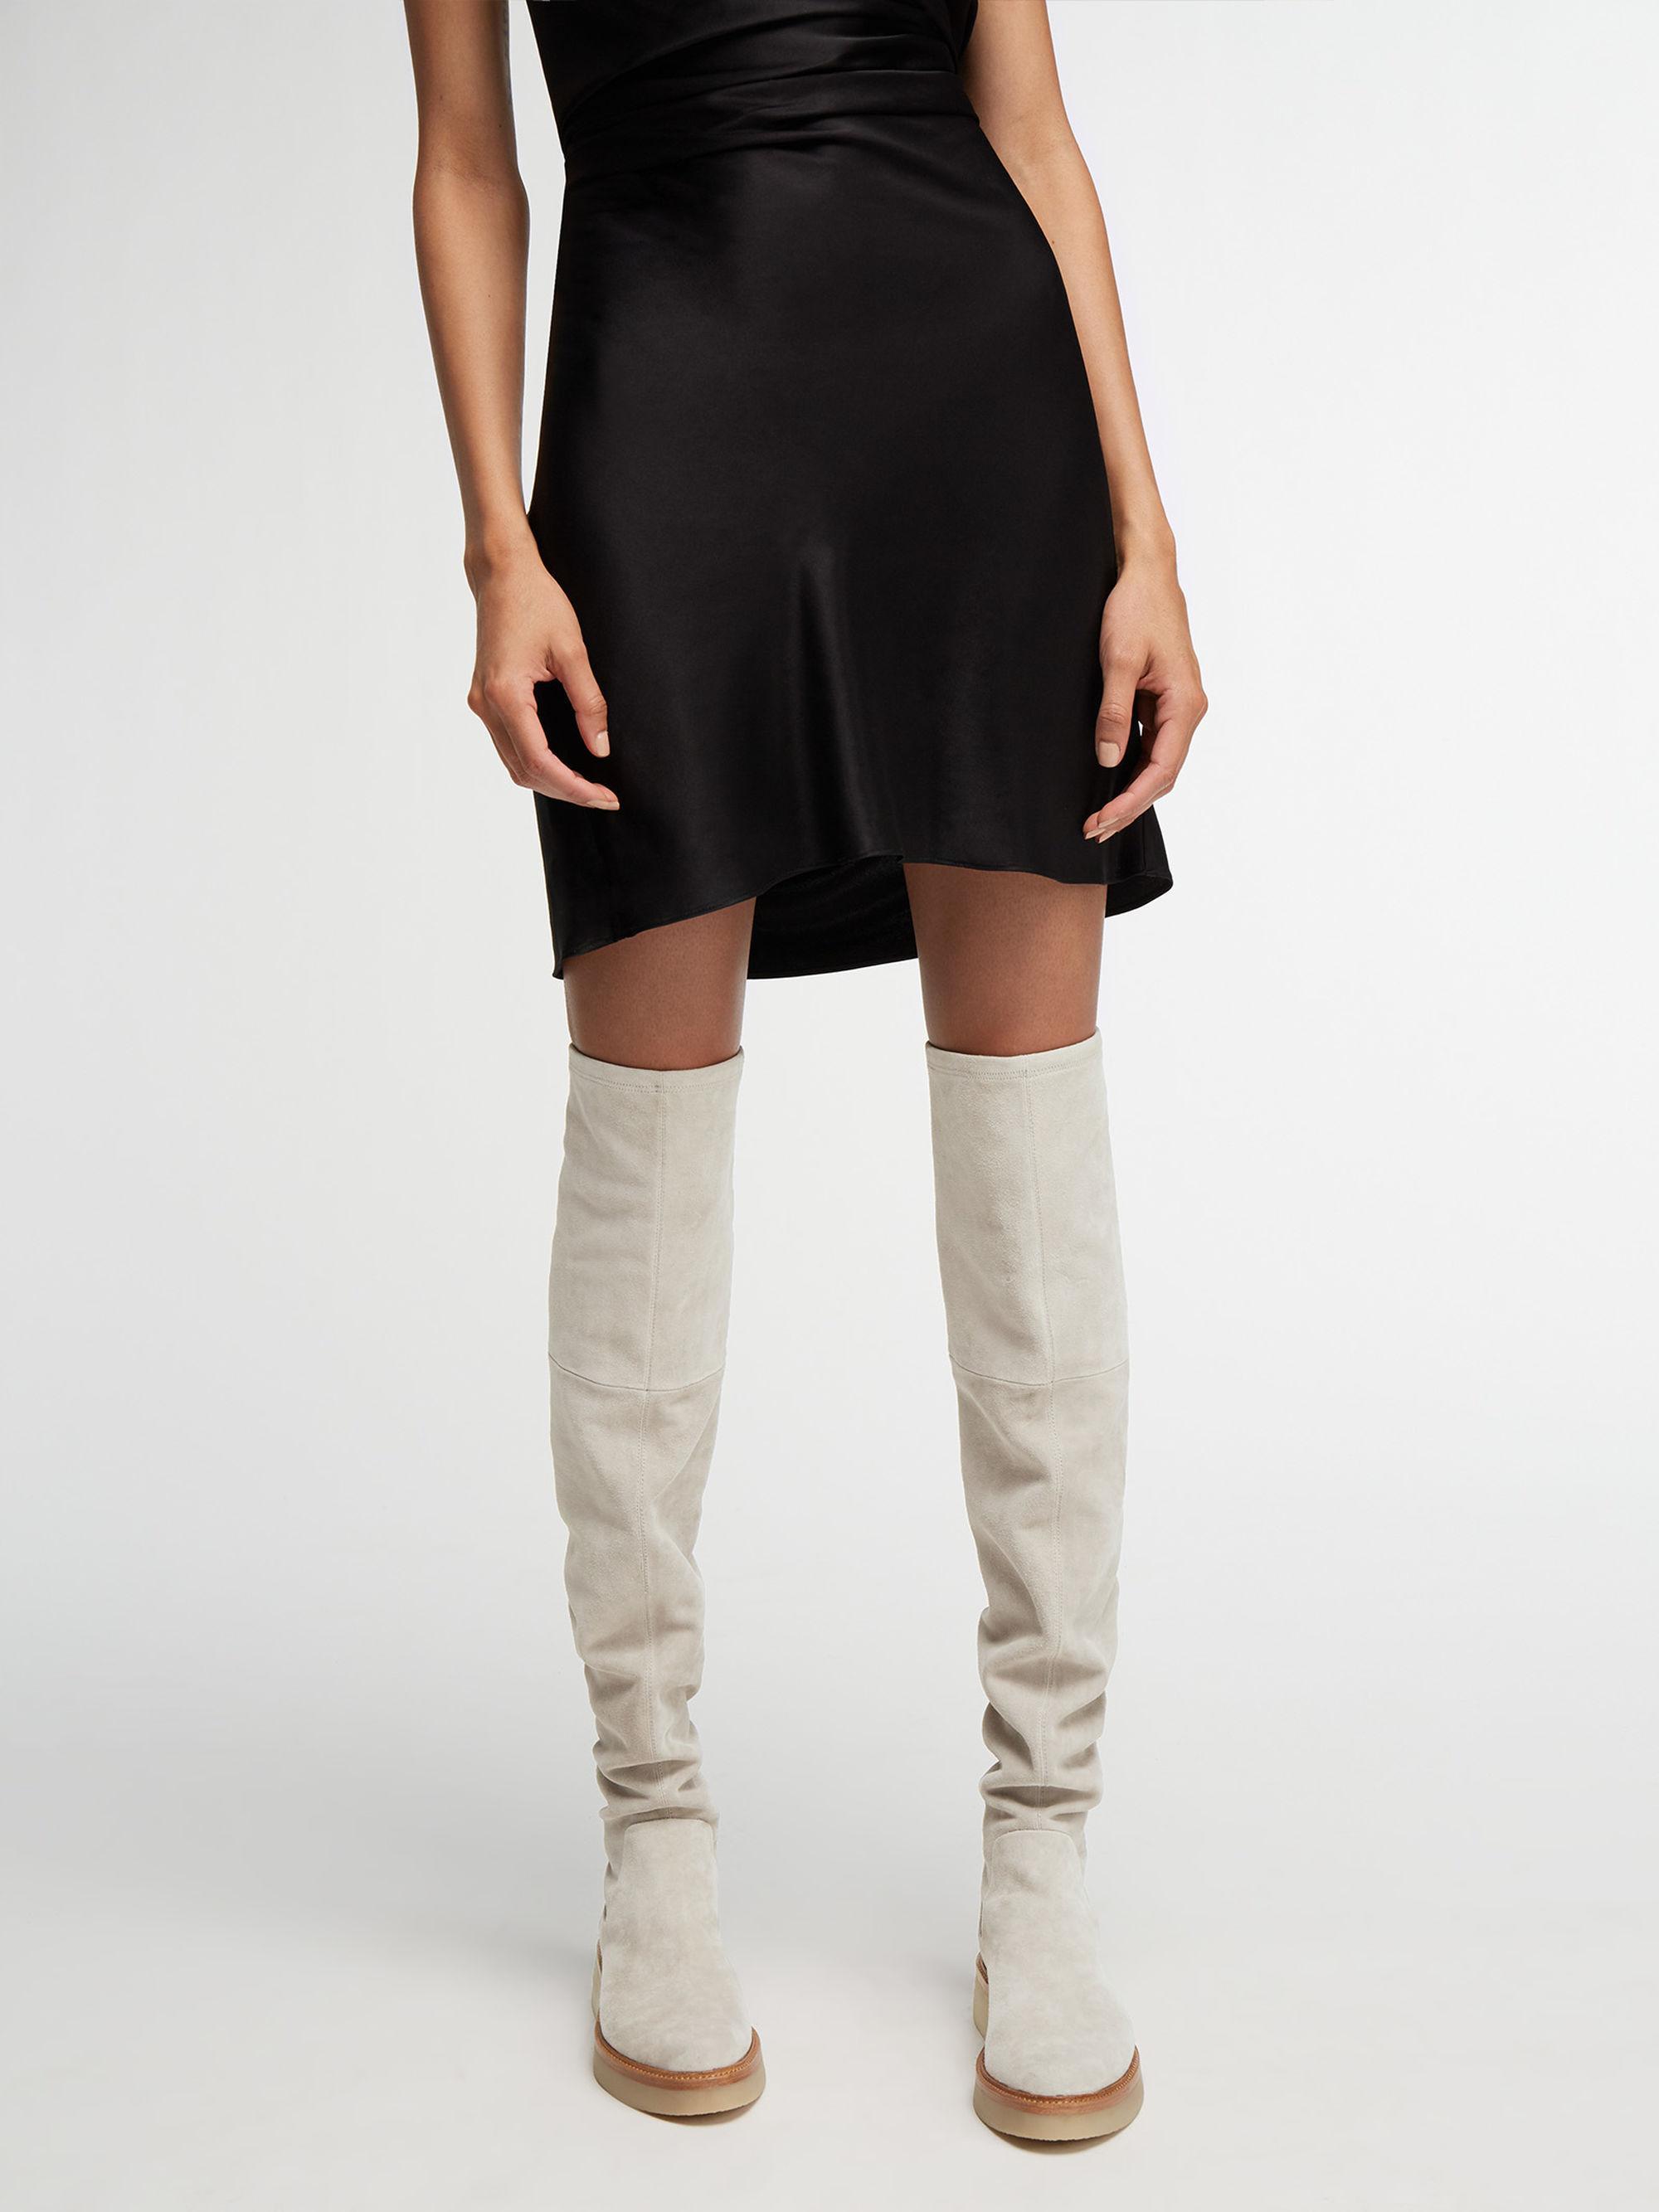 b4a2f30802d DKNY Kyra Stretch Suede Thigh High Boot in Black - Lyst